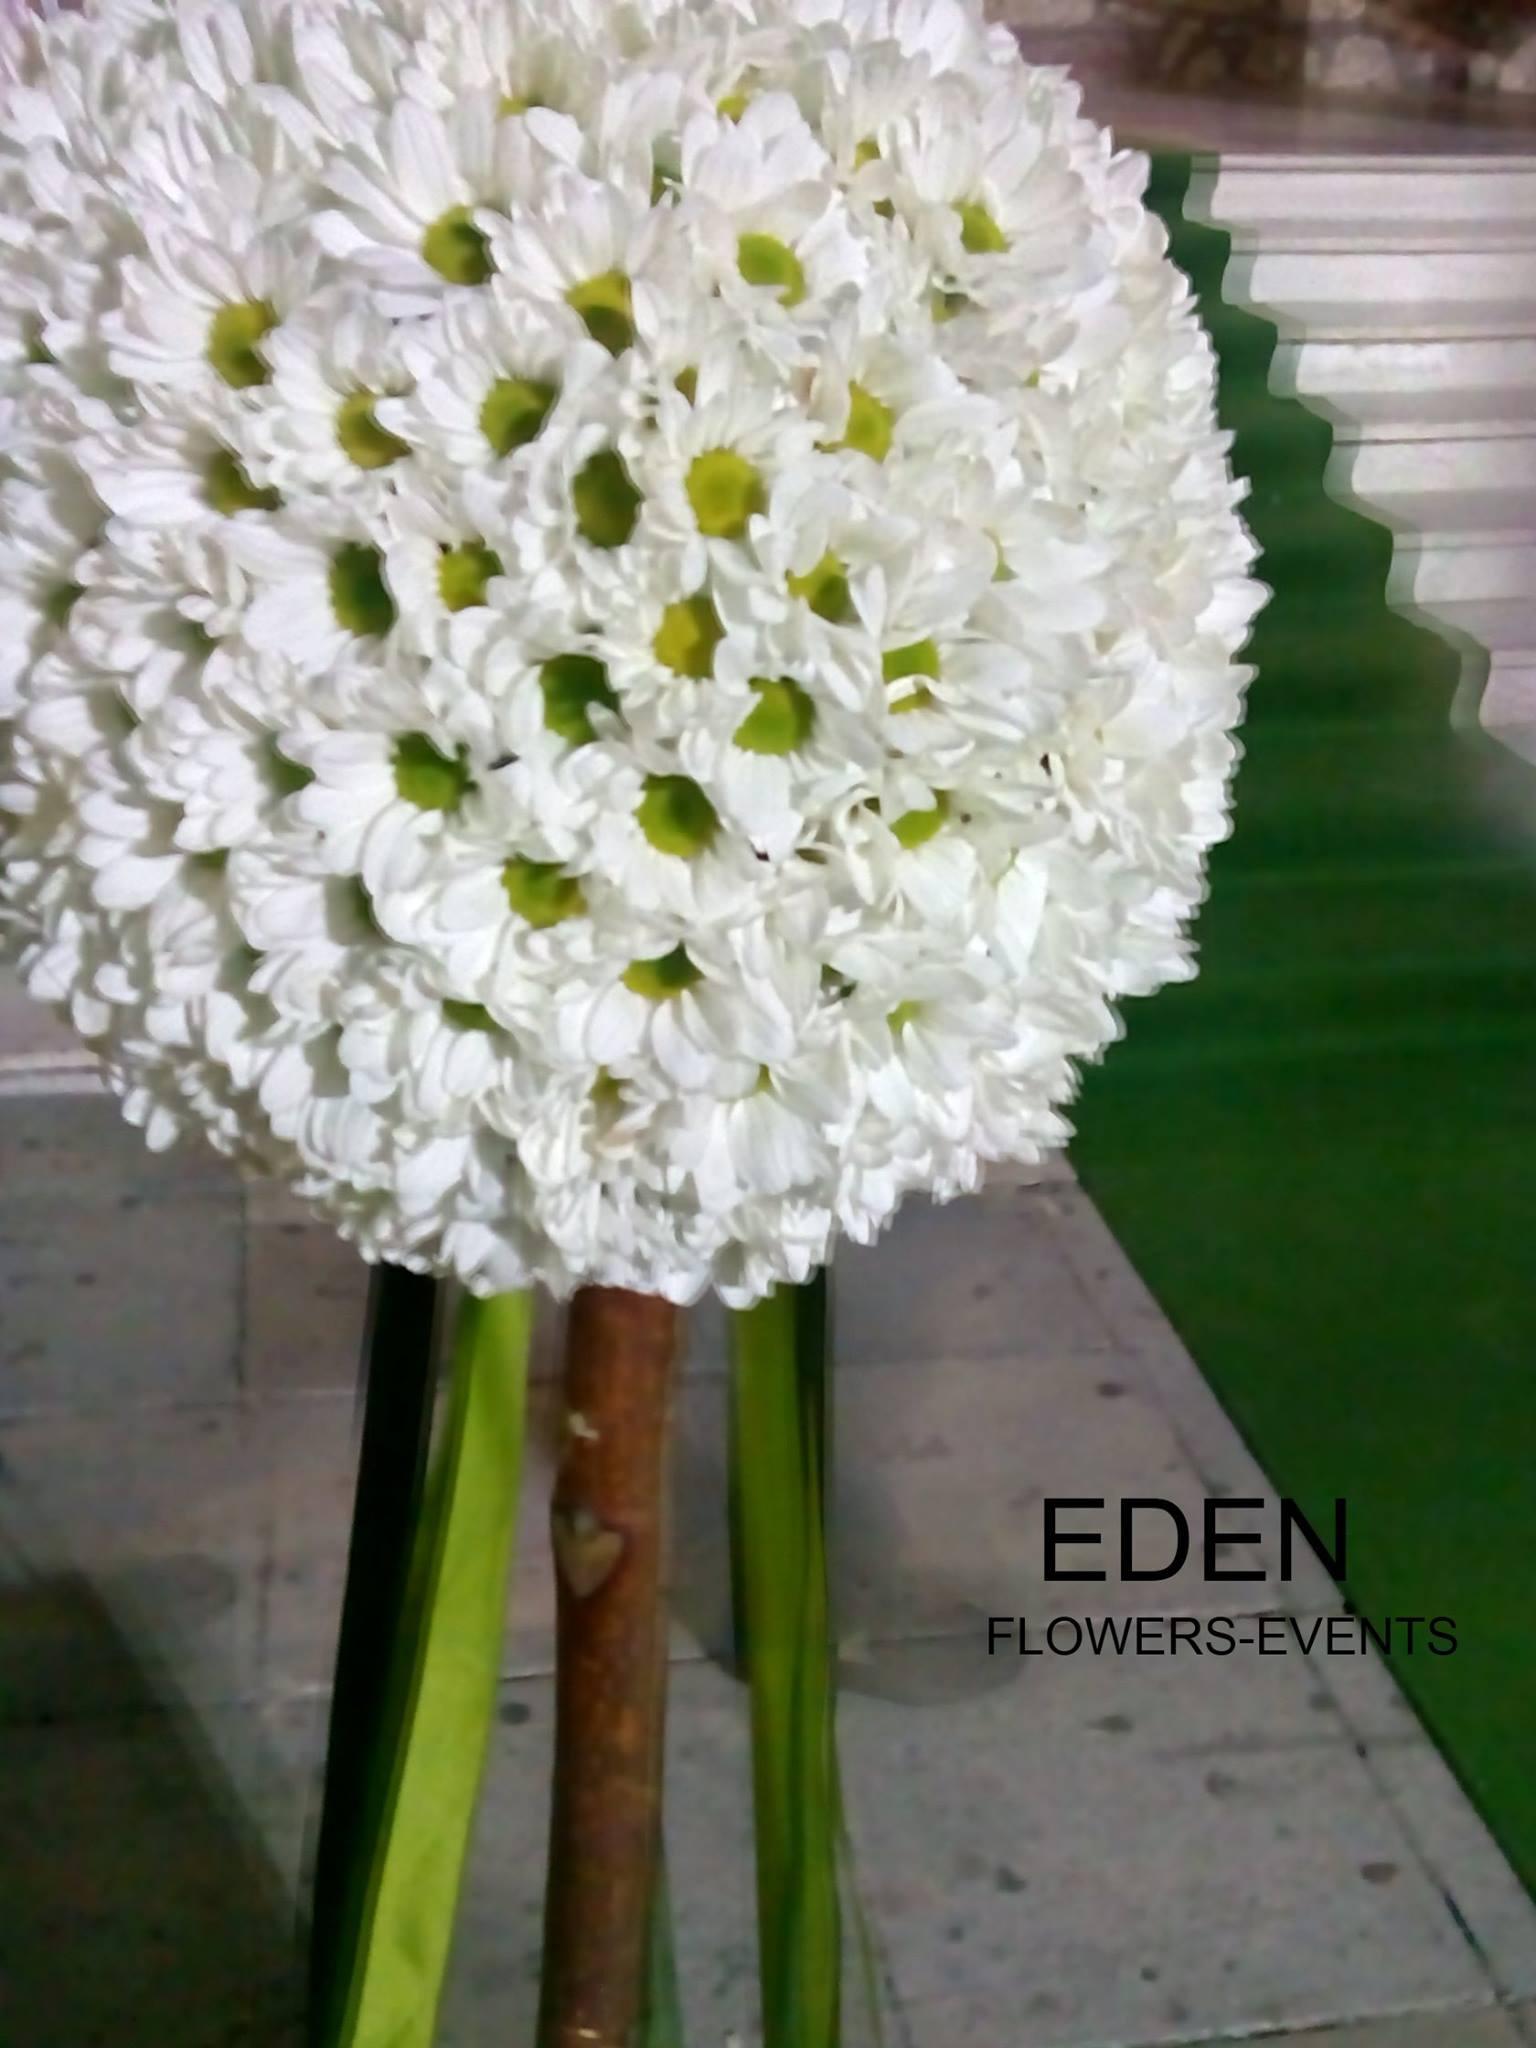 EDEN FLOWERS |  Στολισμοί Εκκλησιών, Νυφικών Αυτοκινήτων, Χώρων Δεξιώσεων, Νυφικές Ανθοδέσμες, φυτά, ανθοστολισμοί